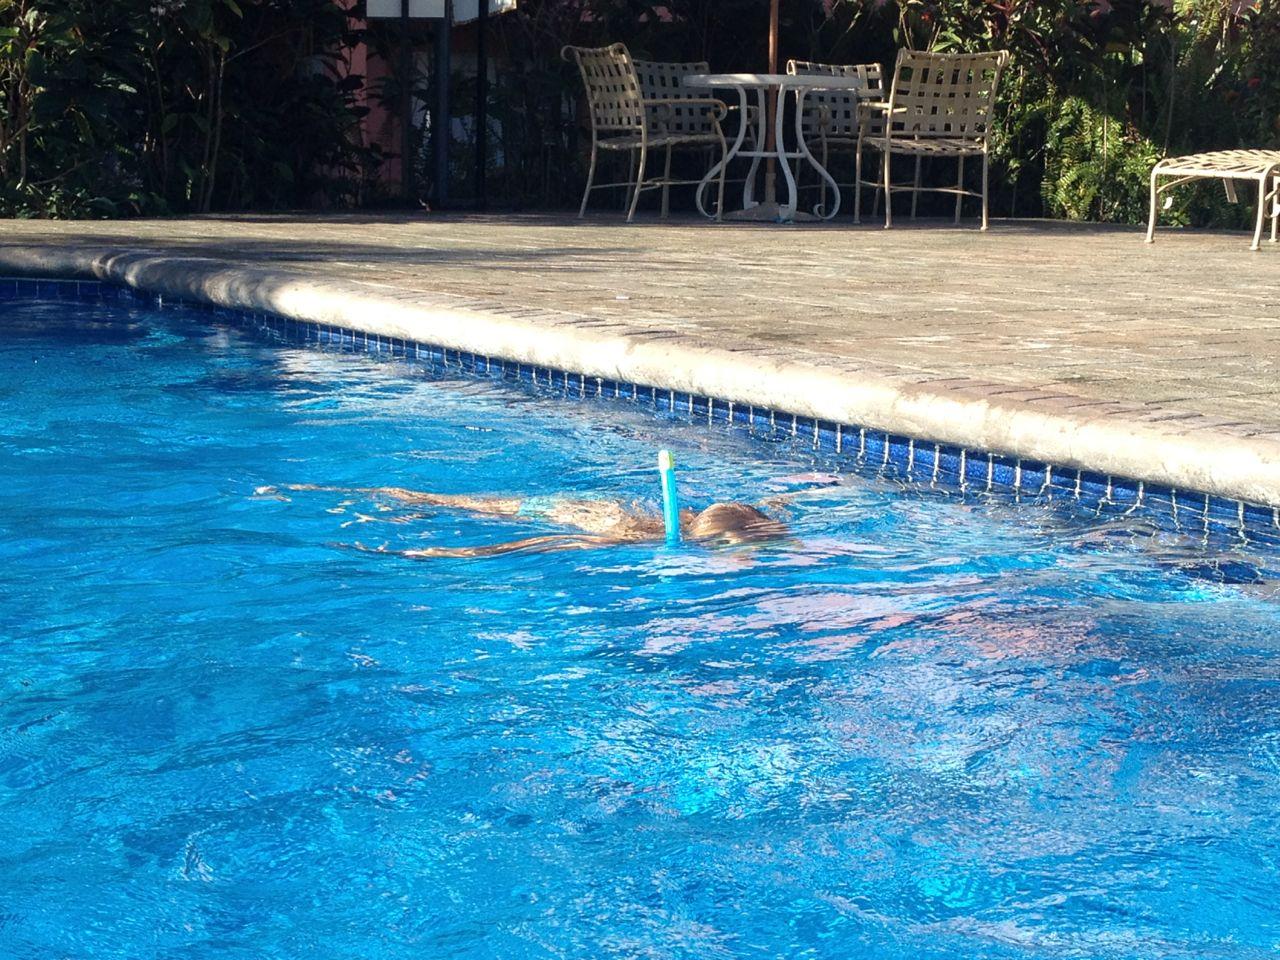 Paula schnorchelt im Pool der Marina in Chaguaramas  Trinidad